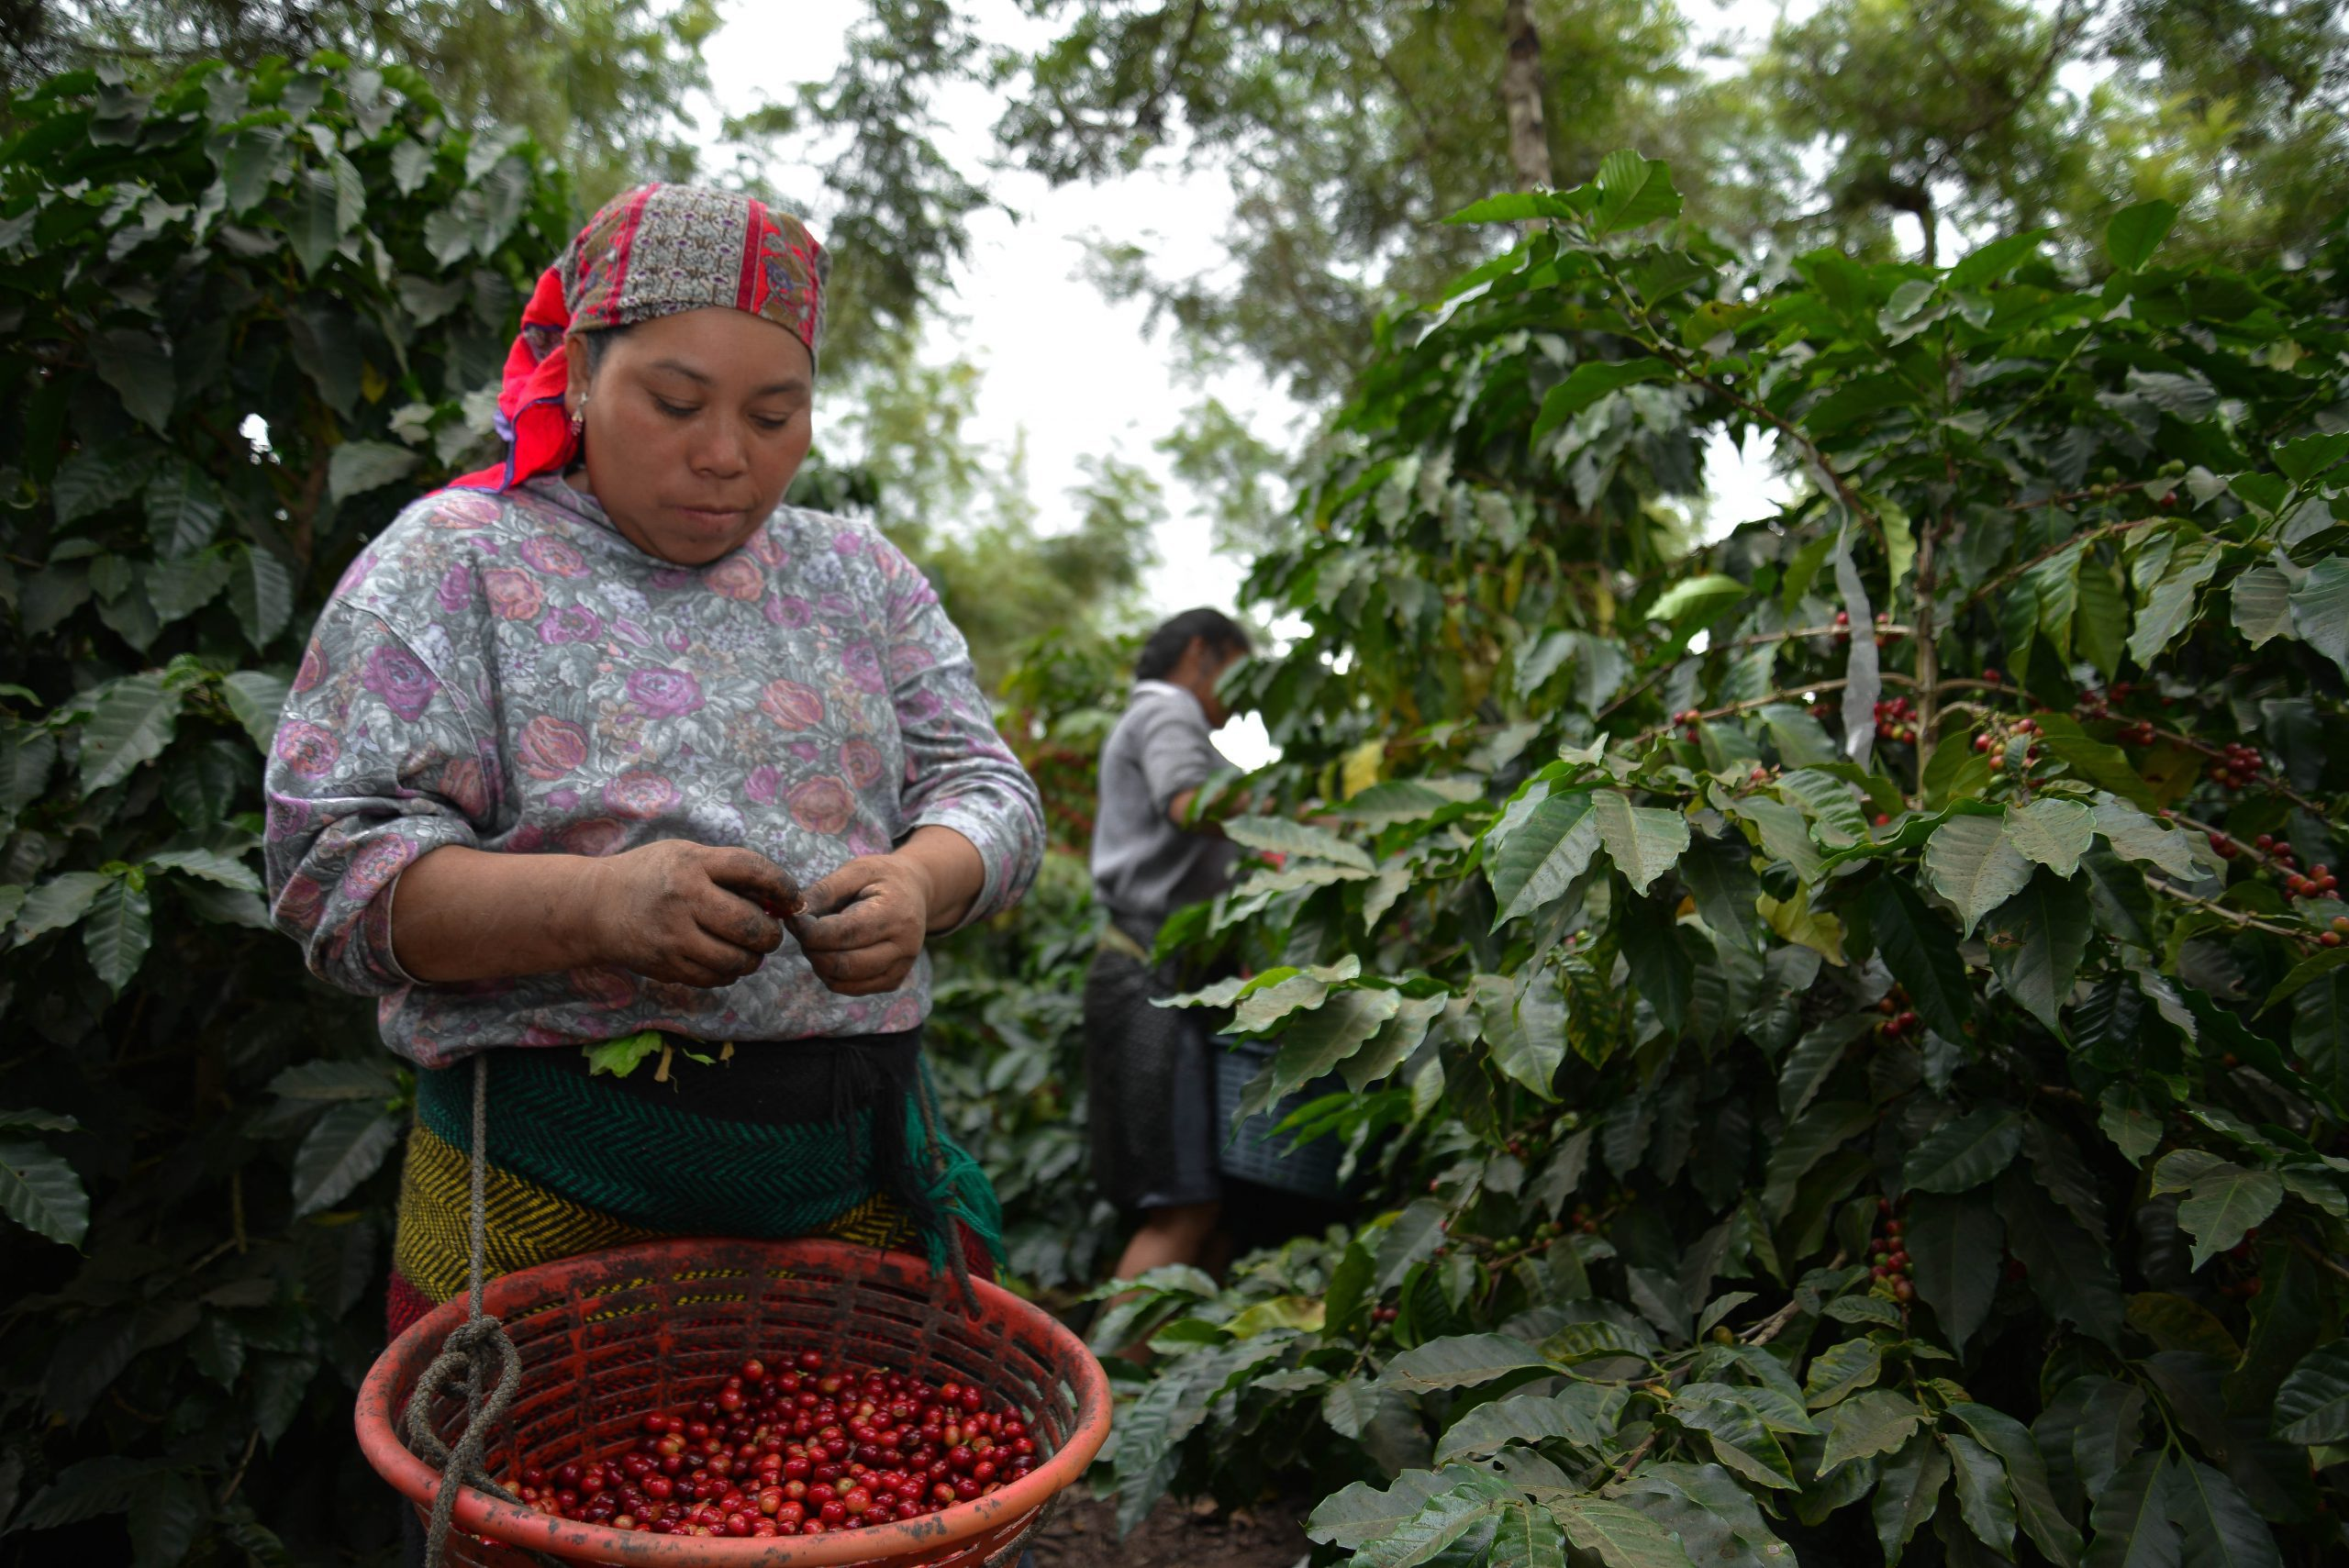 A farmer in Guatemala picks coffee